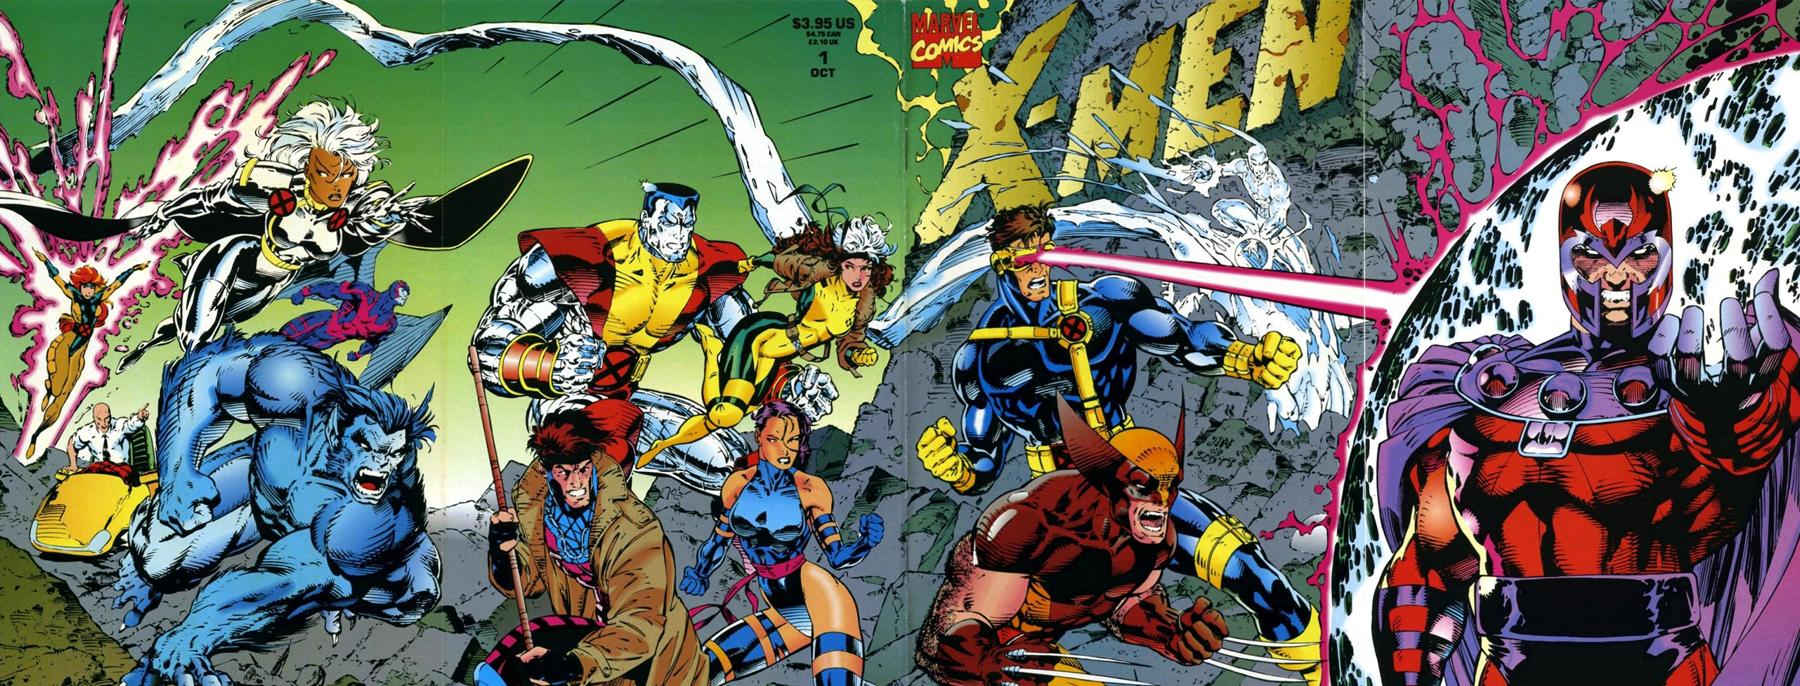 90s x men comic wallpaper - photo #5